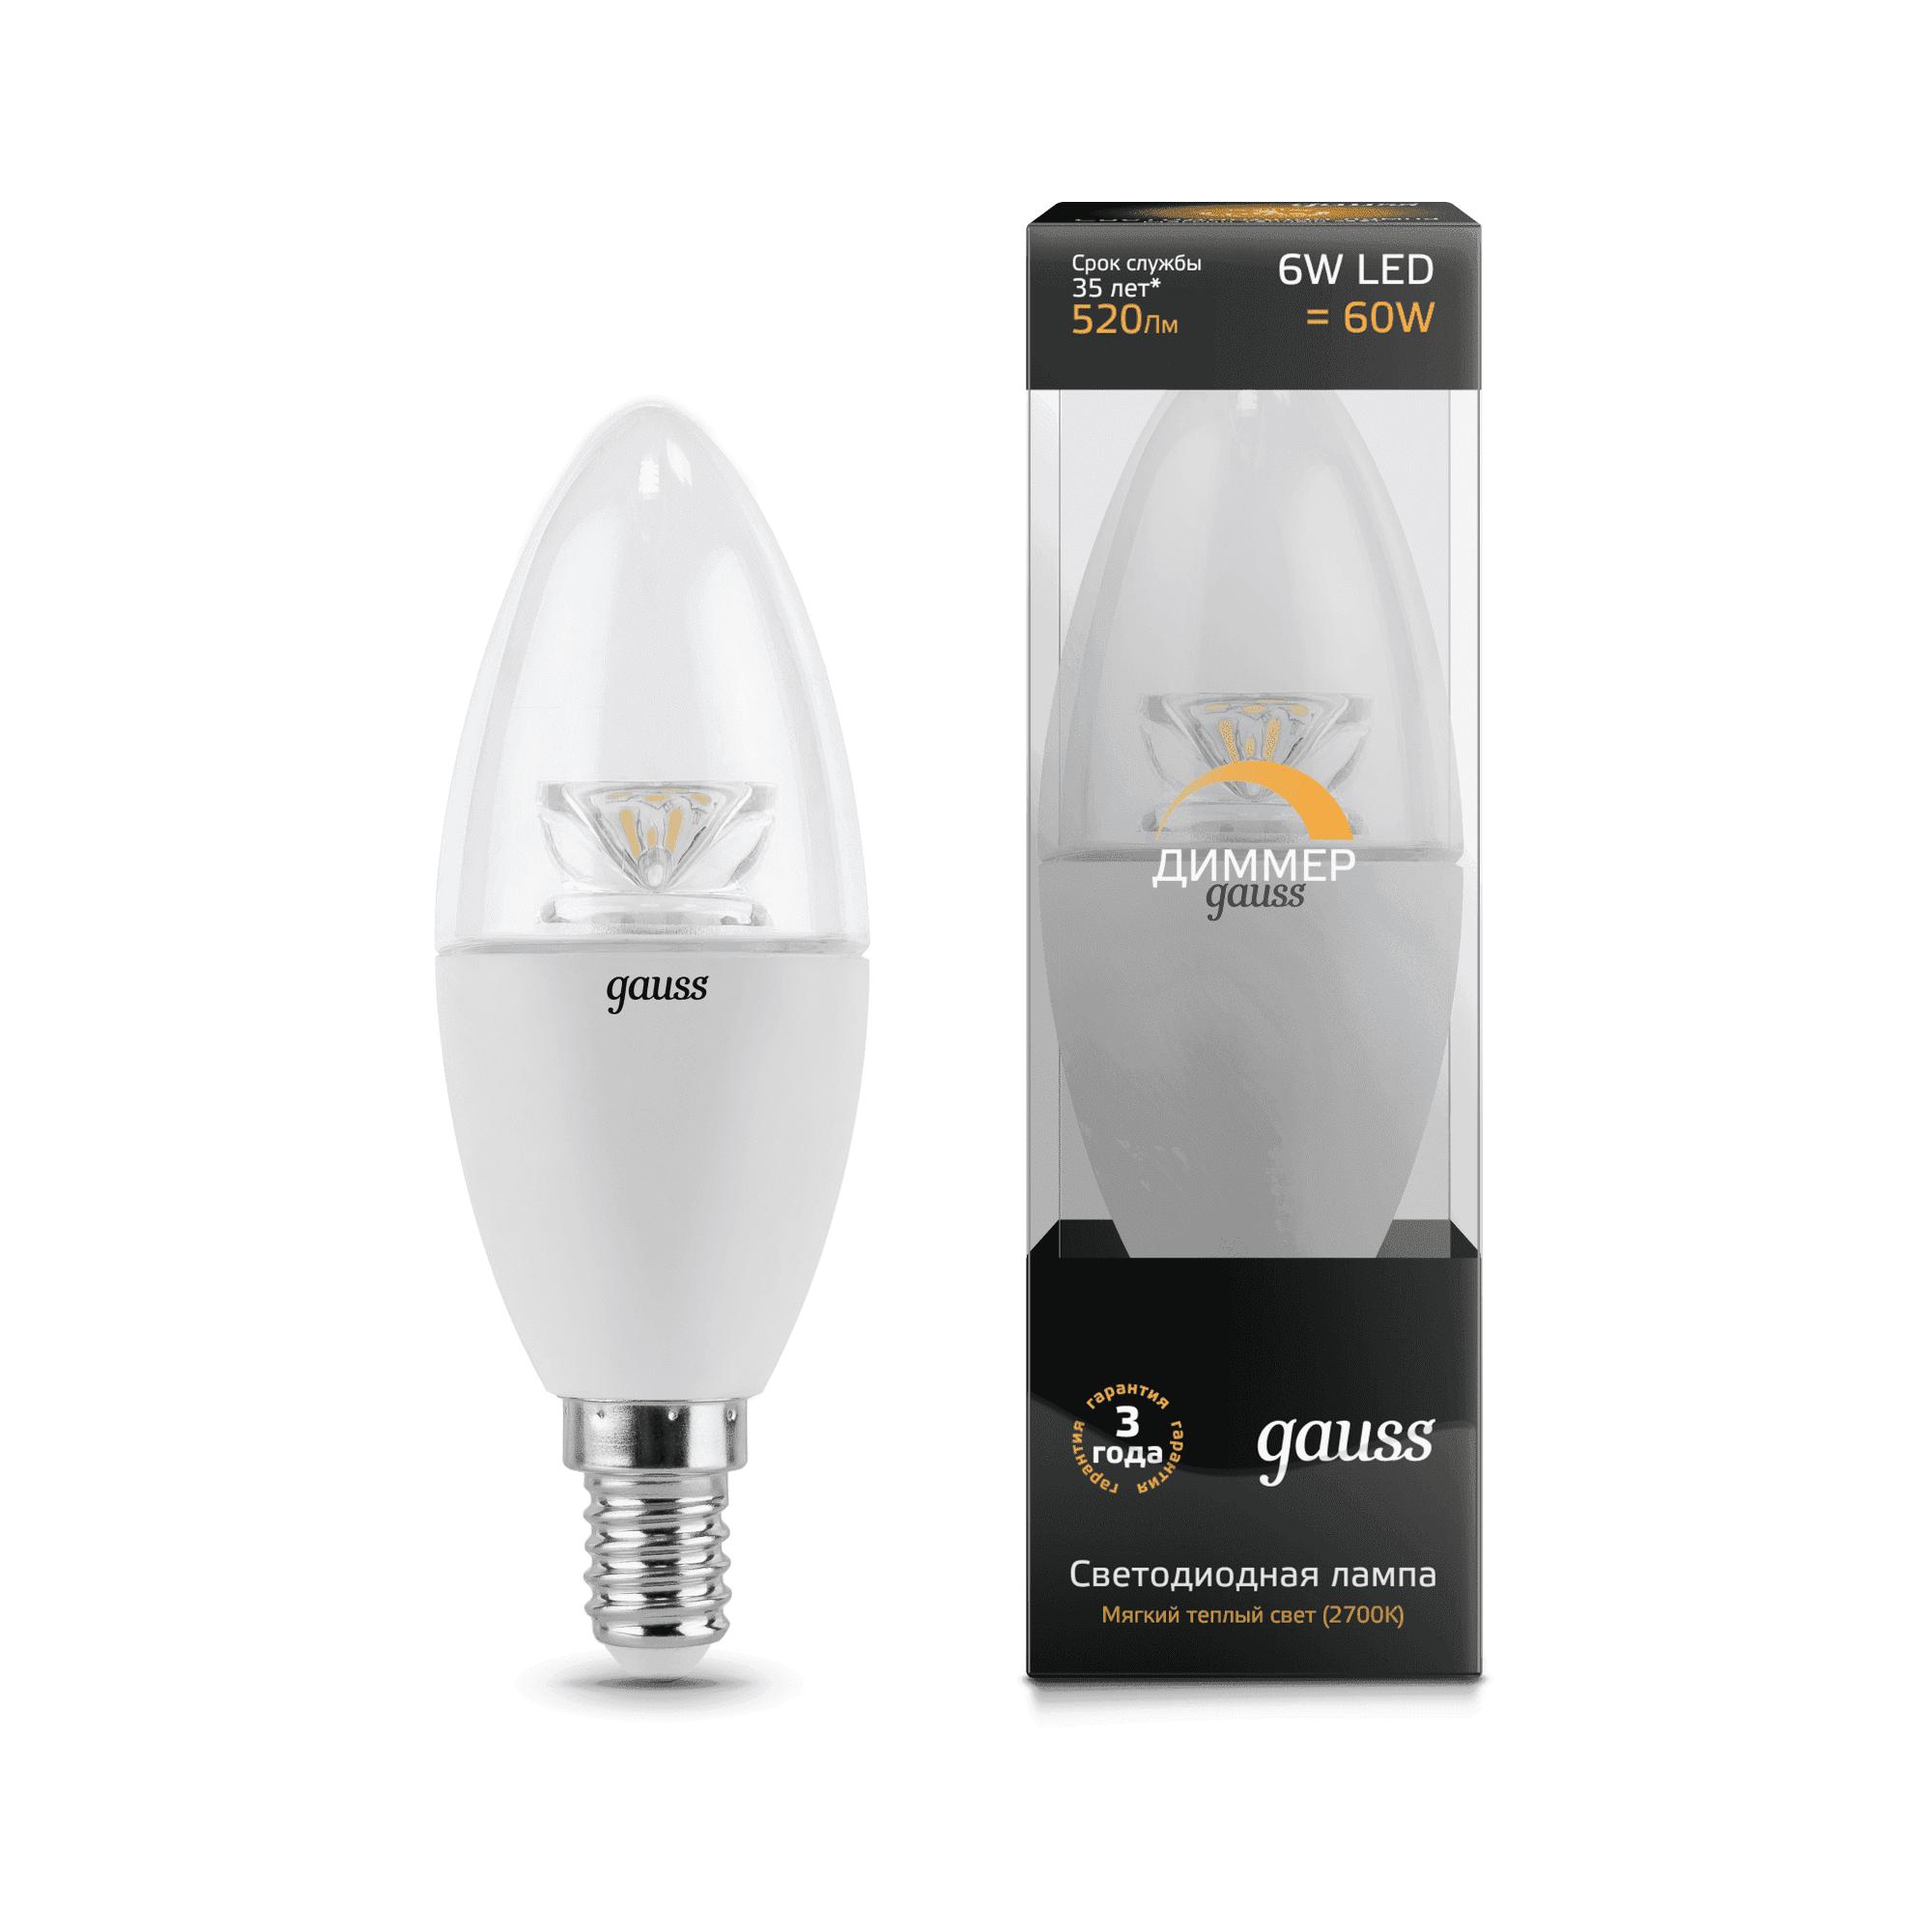 Gauss LED Candle-dim Crystal Clear E14 6W 2700К диммируемая 1/10/50 арт. 103201106-D